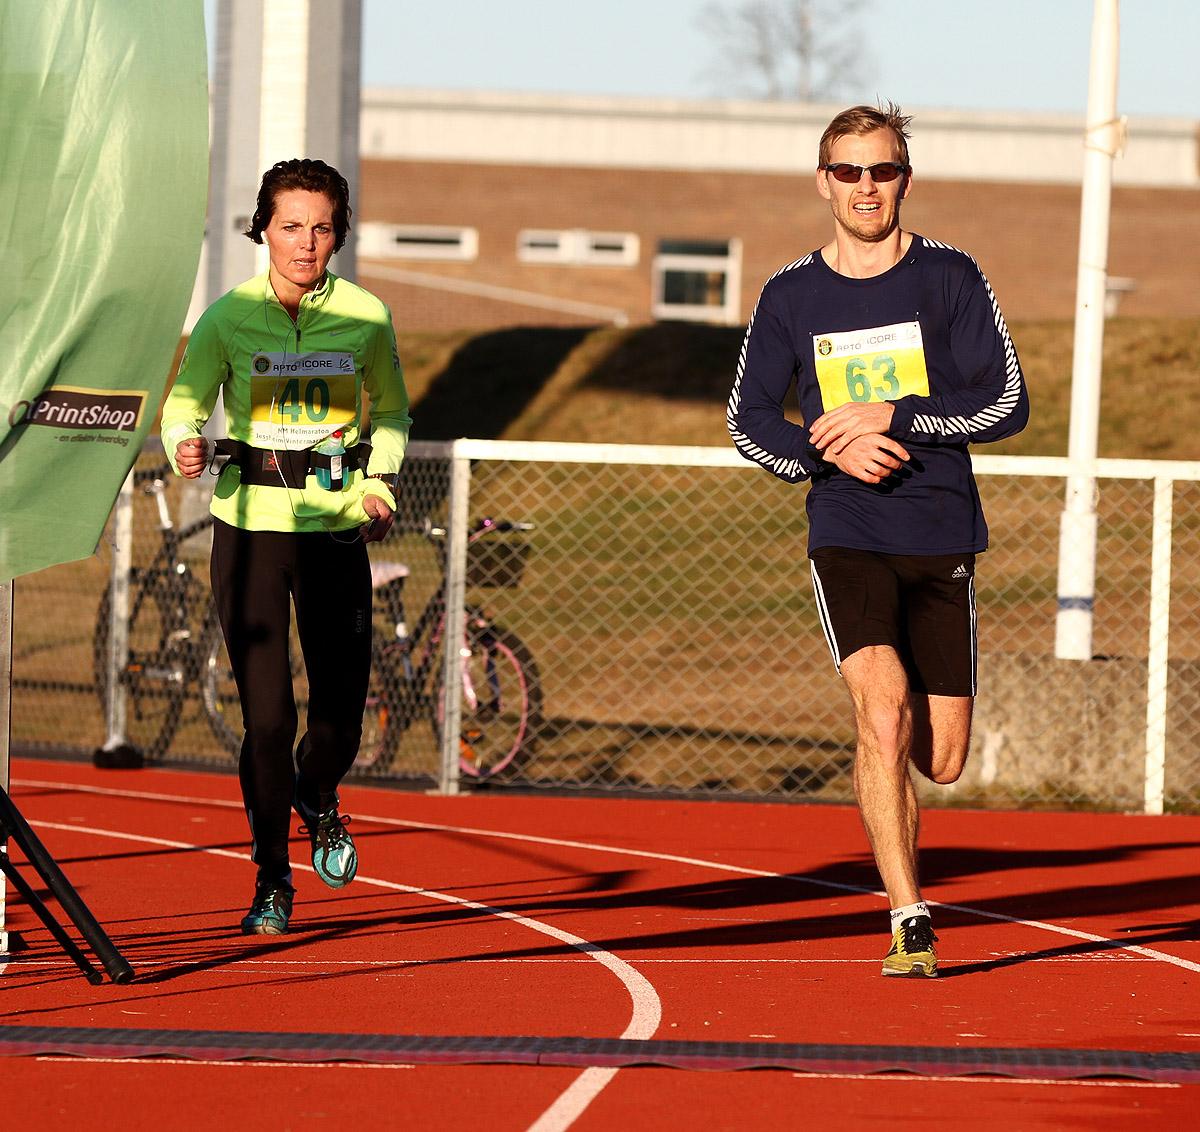 Vintermaraton2013_Elin-Drangsholt_31-5km_Didrik-Hermansen_Maal.jpg